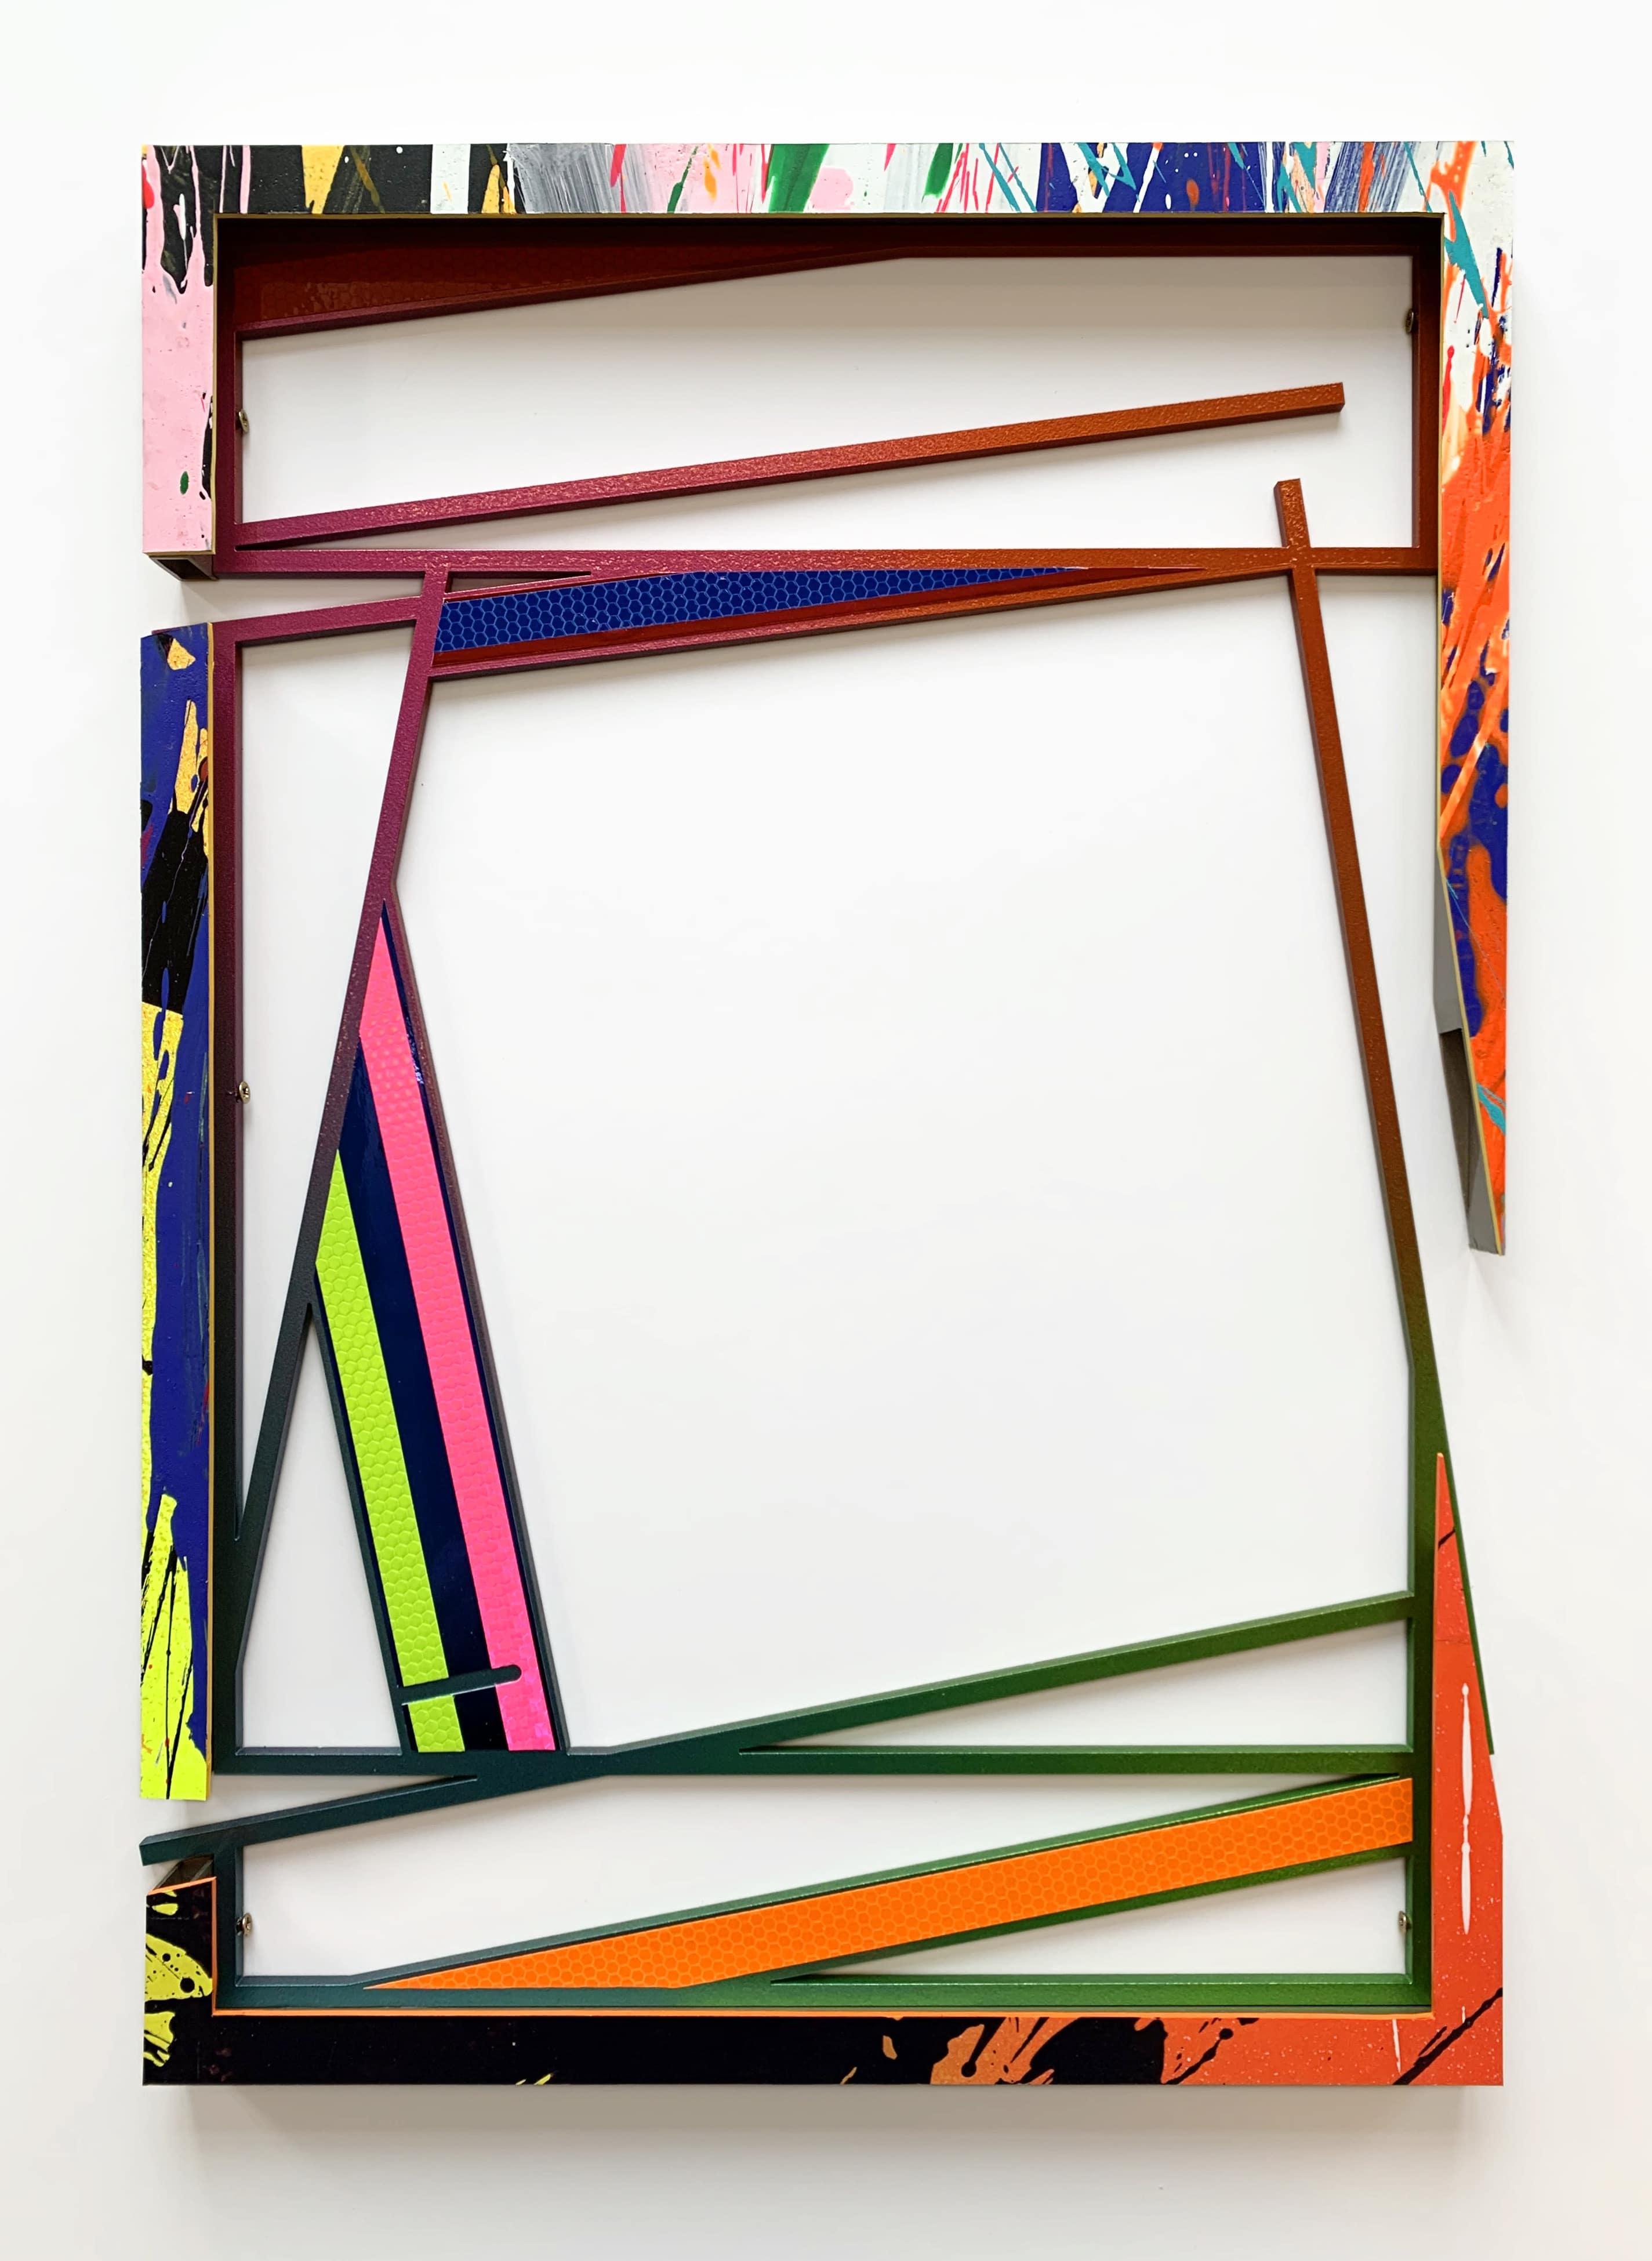 NemesM_F.O.M.O.-05_2020_57x40cm_aluminium-waterjet-aluminium-carpaint-acrilyc-foamex-pvc-light-reflective-vinyl-mirror-board-min